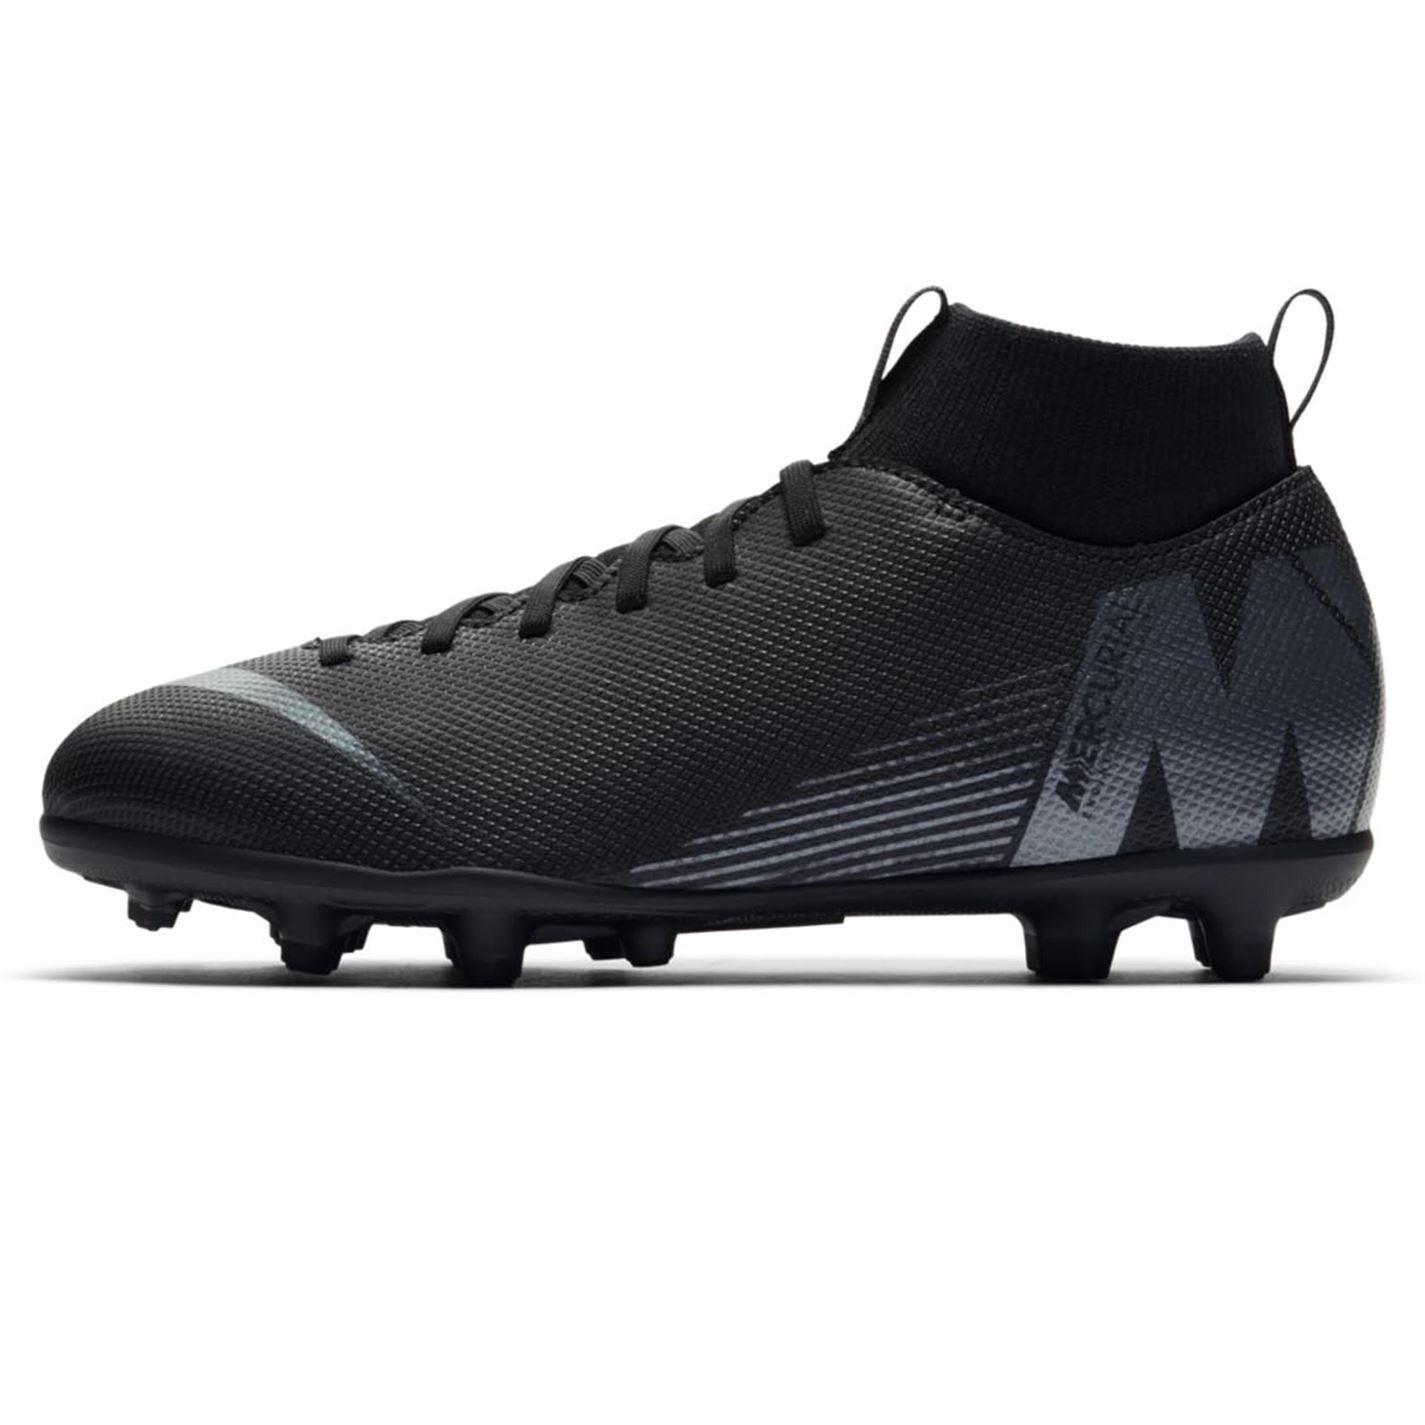 Nike-MERCURIAL-SUPERFLY-Club-DF-TERRA-FERMA-SCARPE-DA-CALCIO-JUNIOR-CALCIO-Cunei miniatura 3